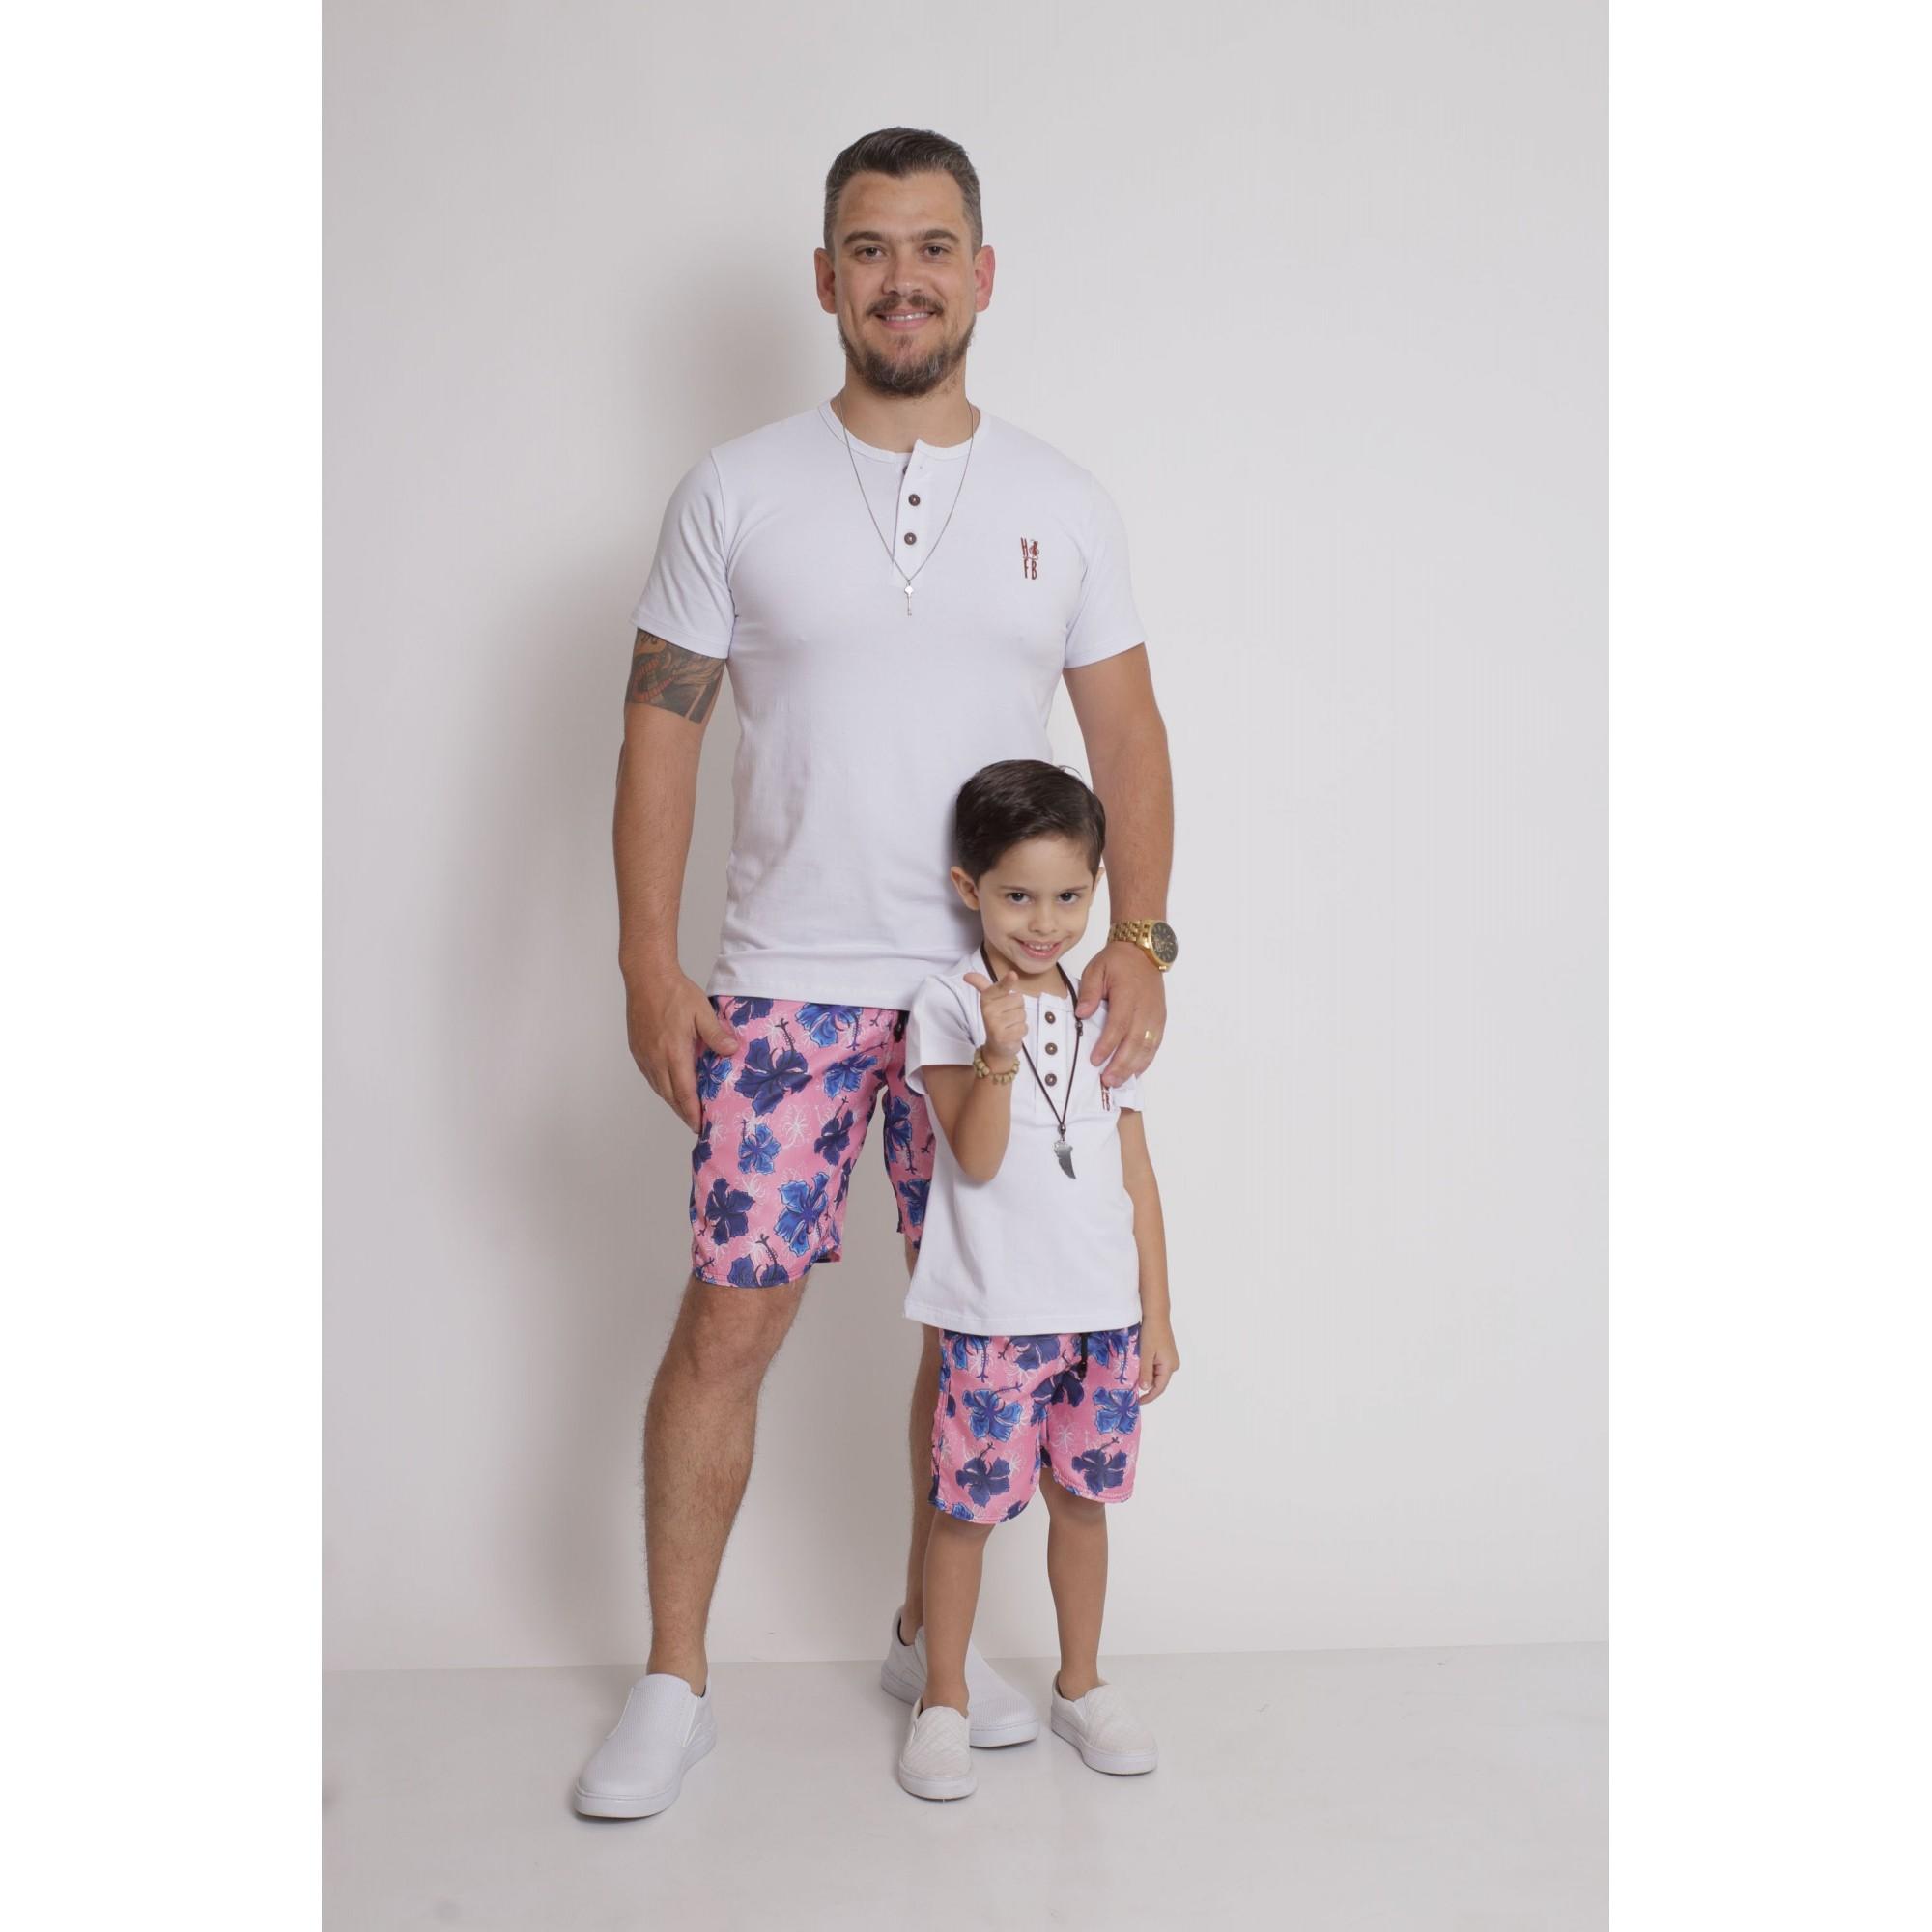 PAI E FILHO > Kit 02 Bermudas Rosa Floral [Coleção Tal Pai Tal Filho]  - Heitor Fashion Brazil